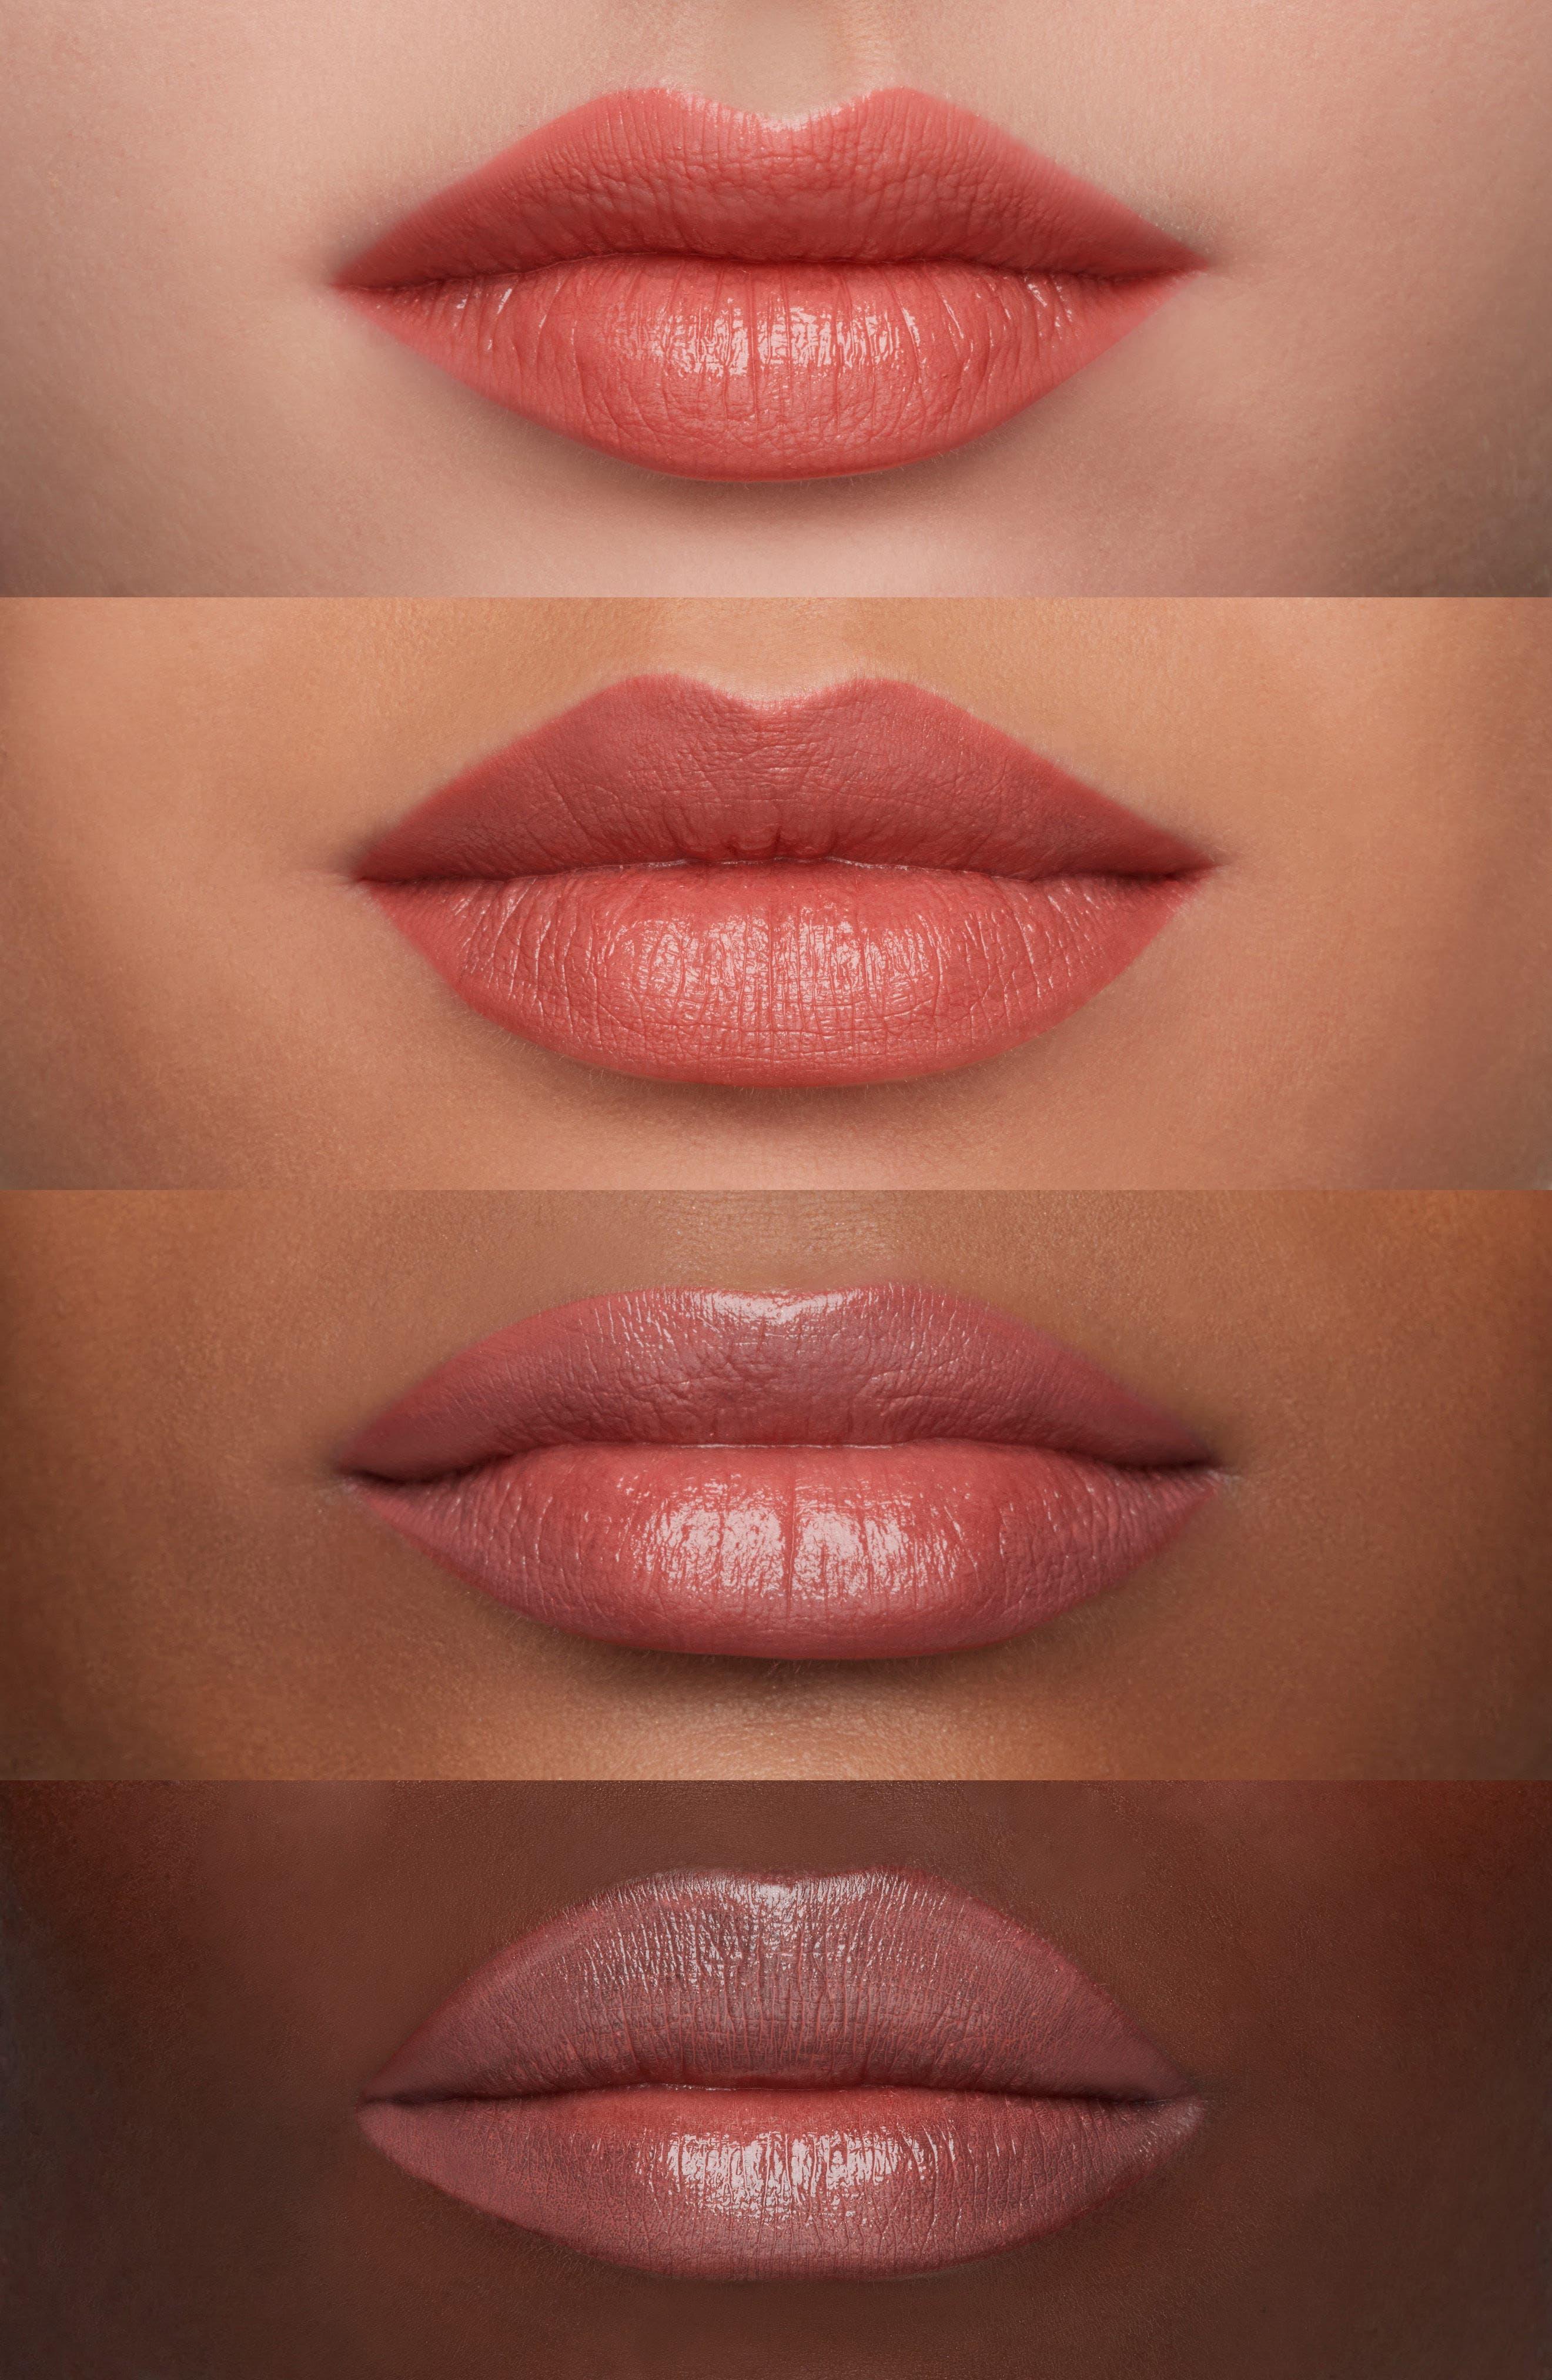 Tom Ford Lipstick Nordstrom